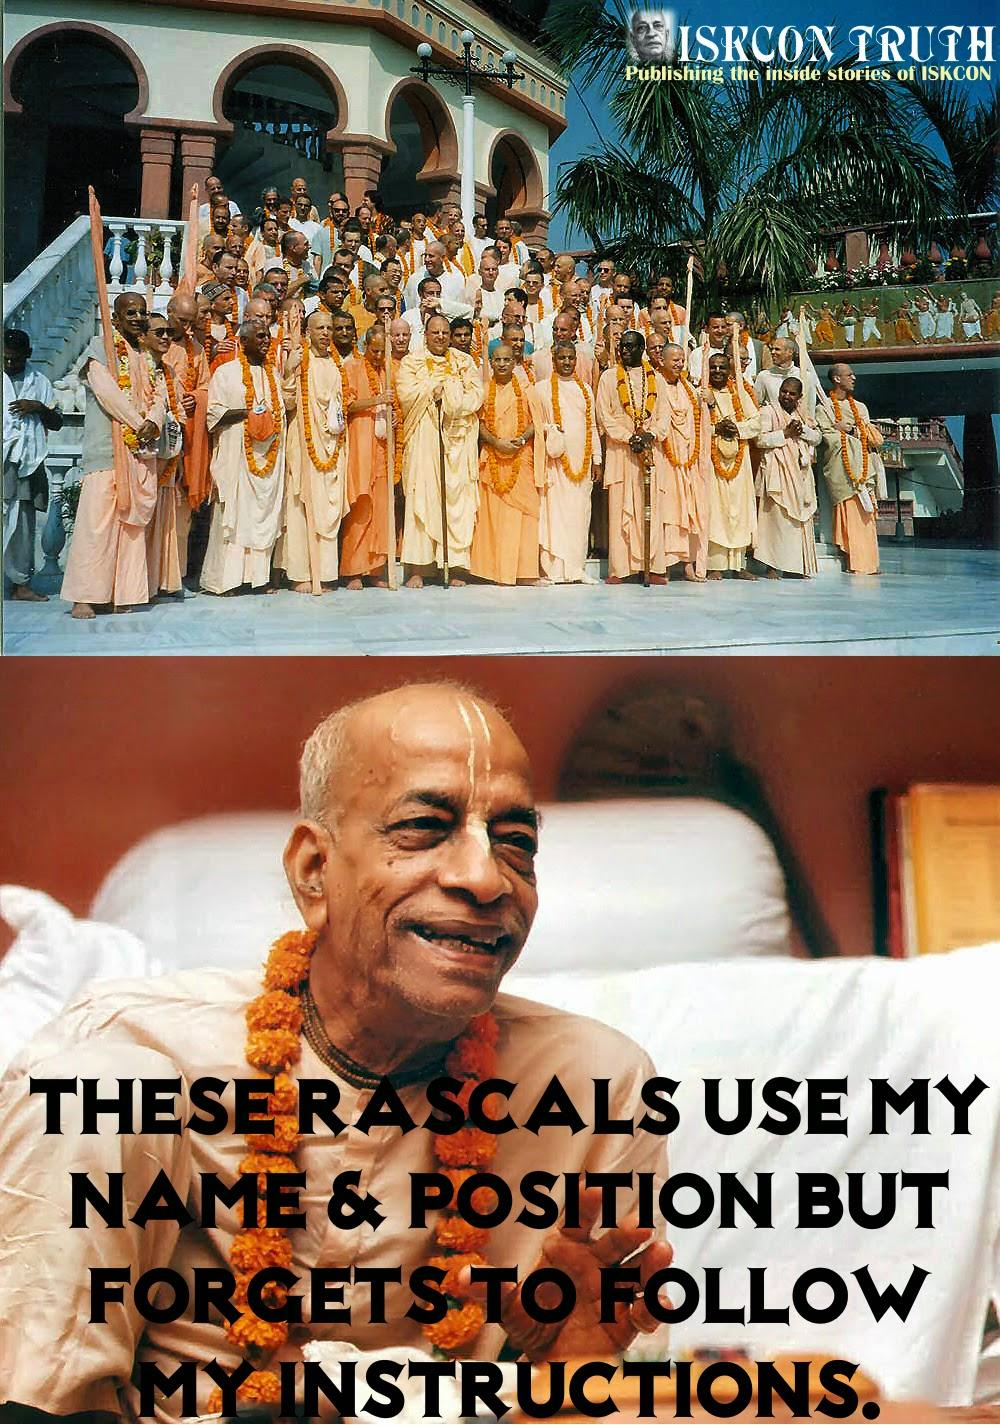 ISKCON guru trolled by prabhupada